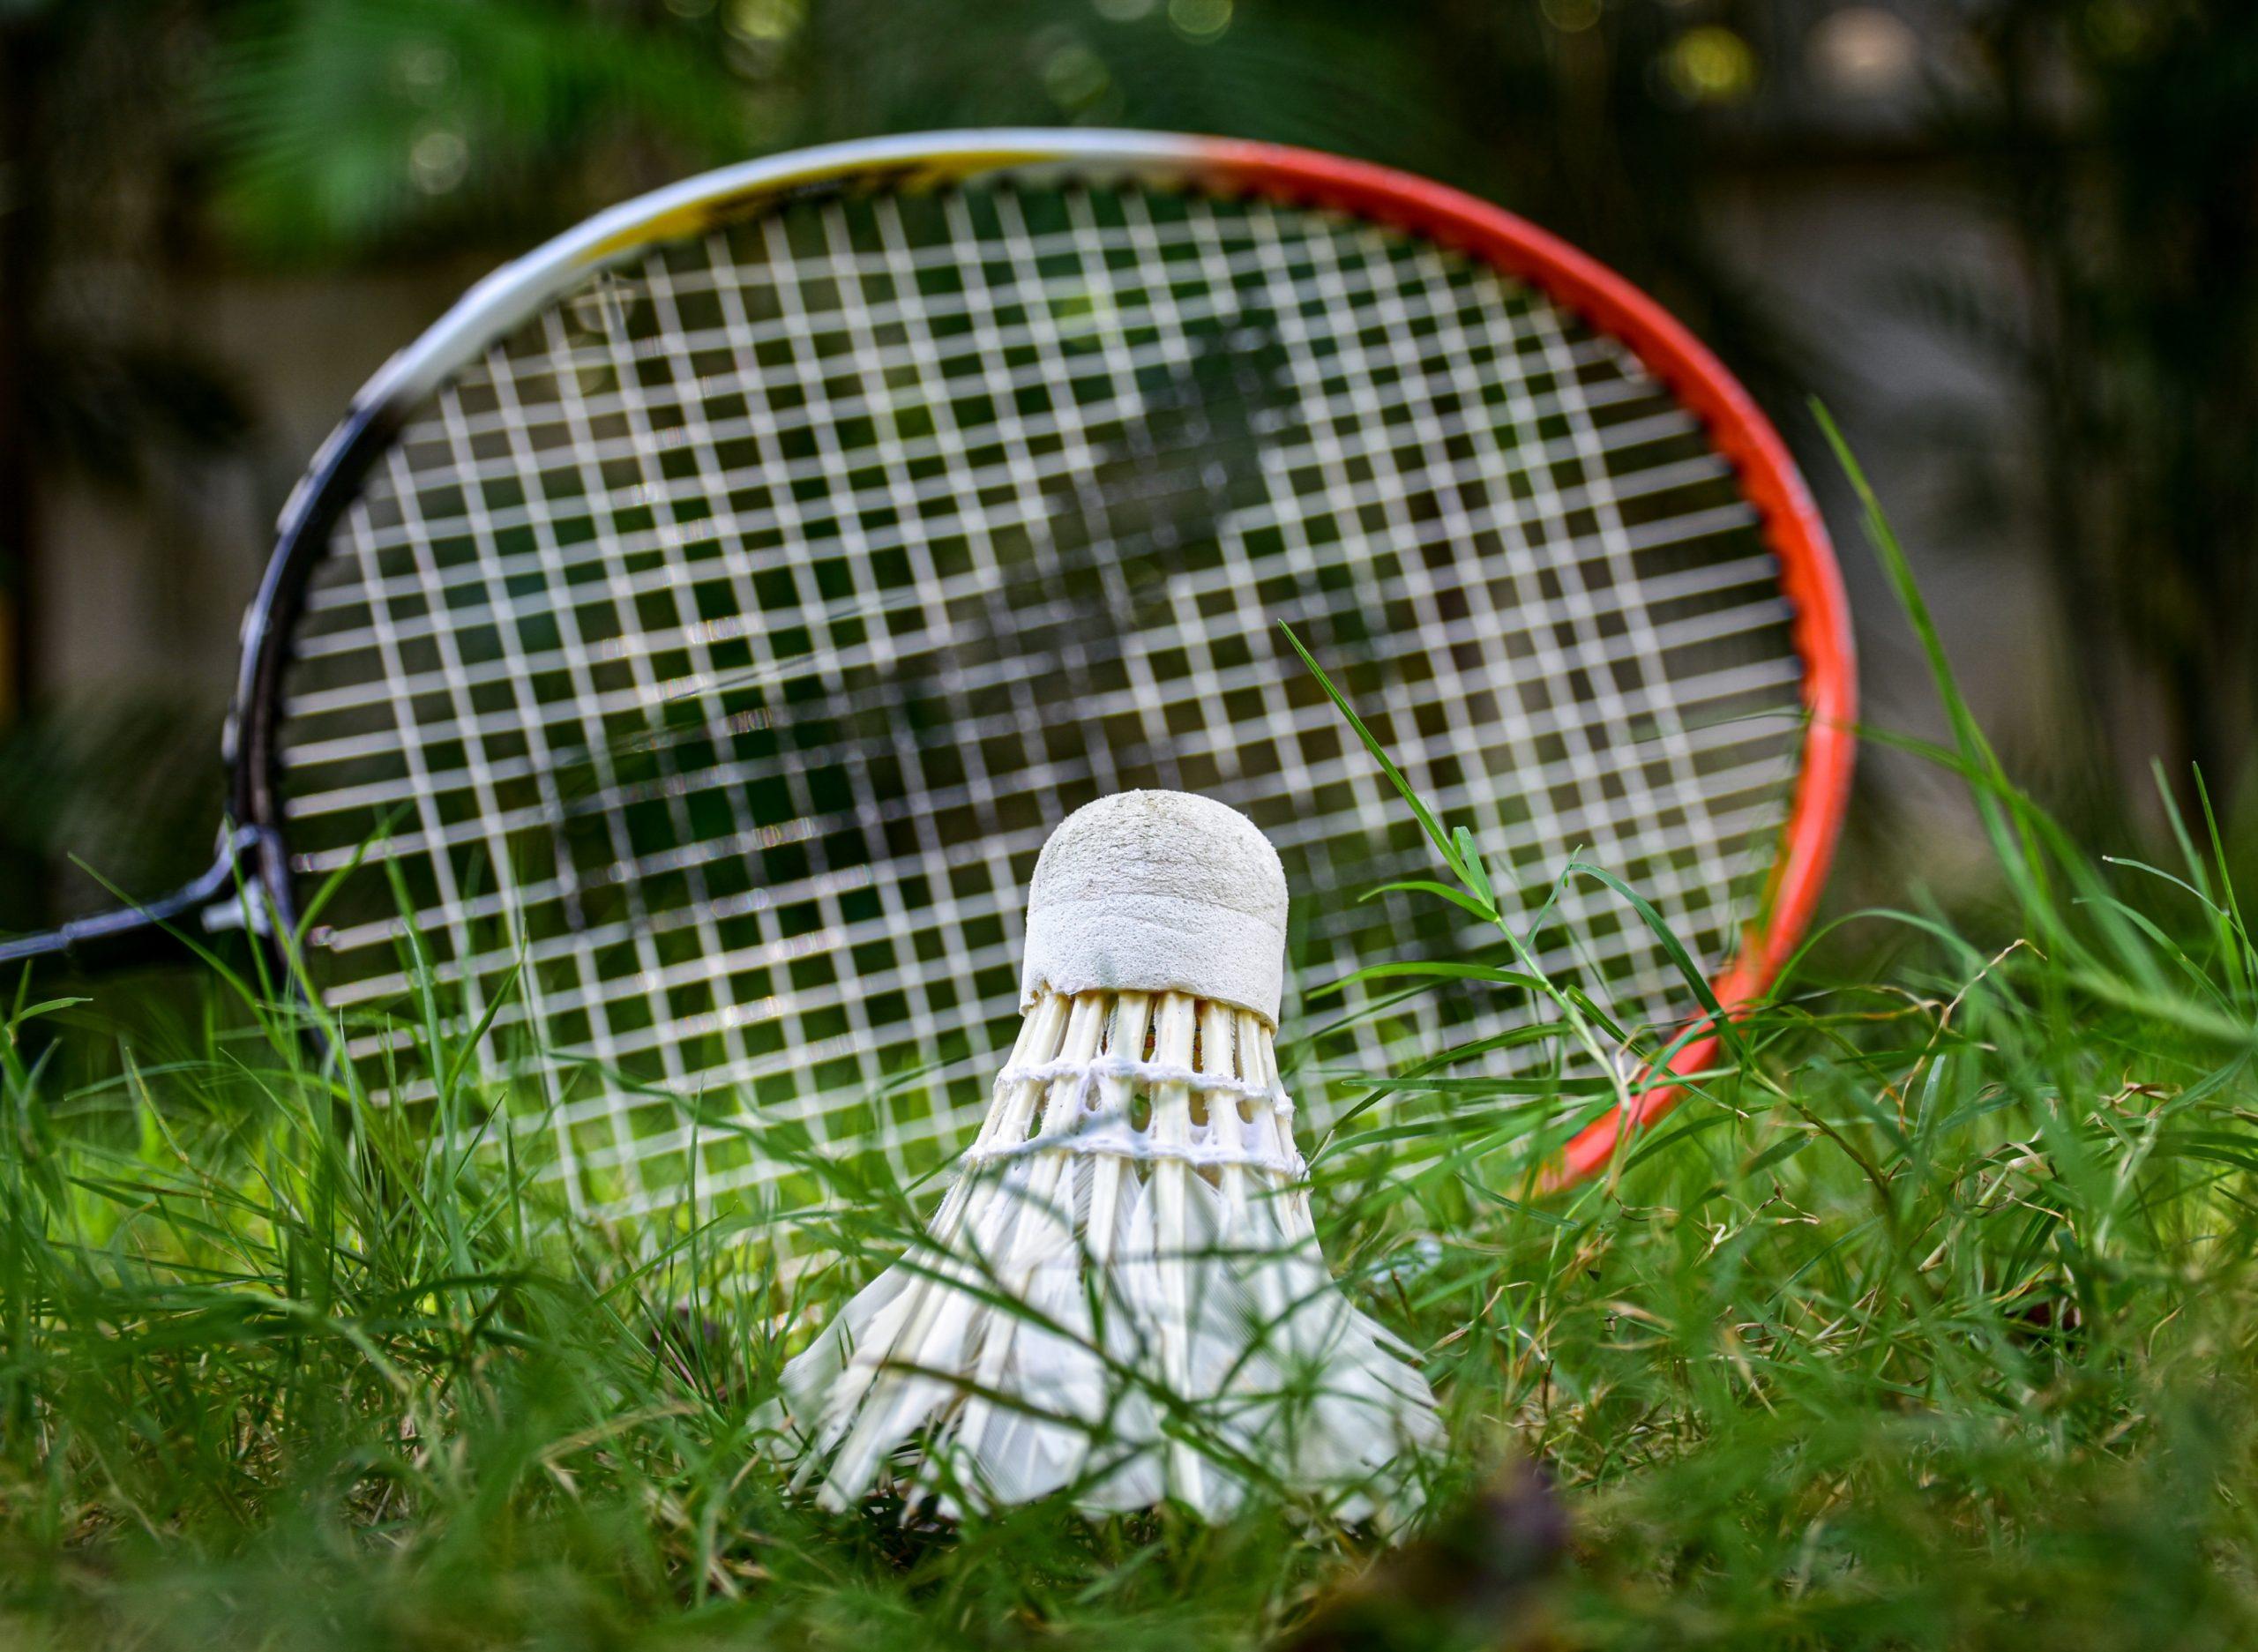 Badminton – Racket and shuttle cock